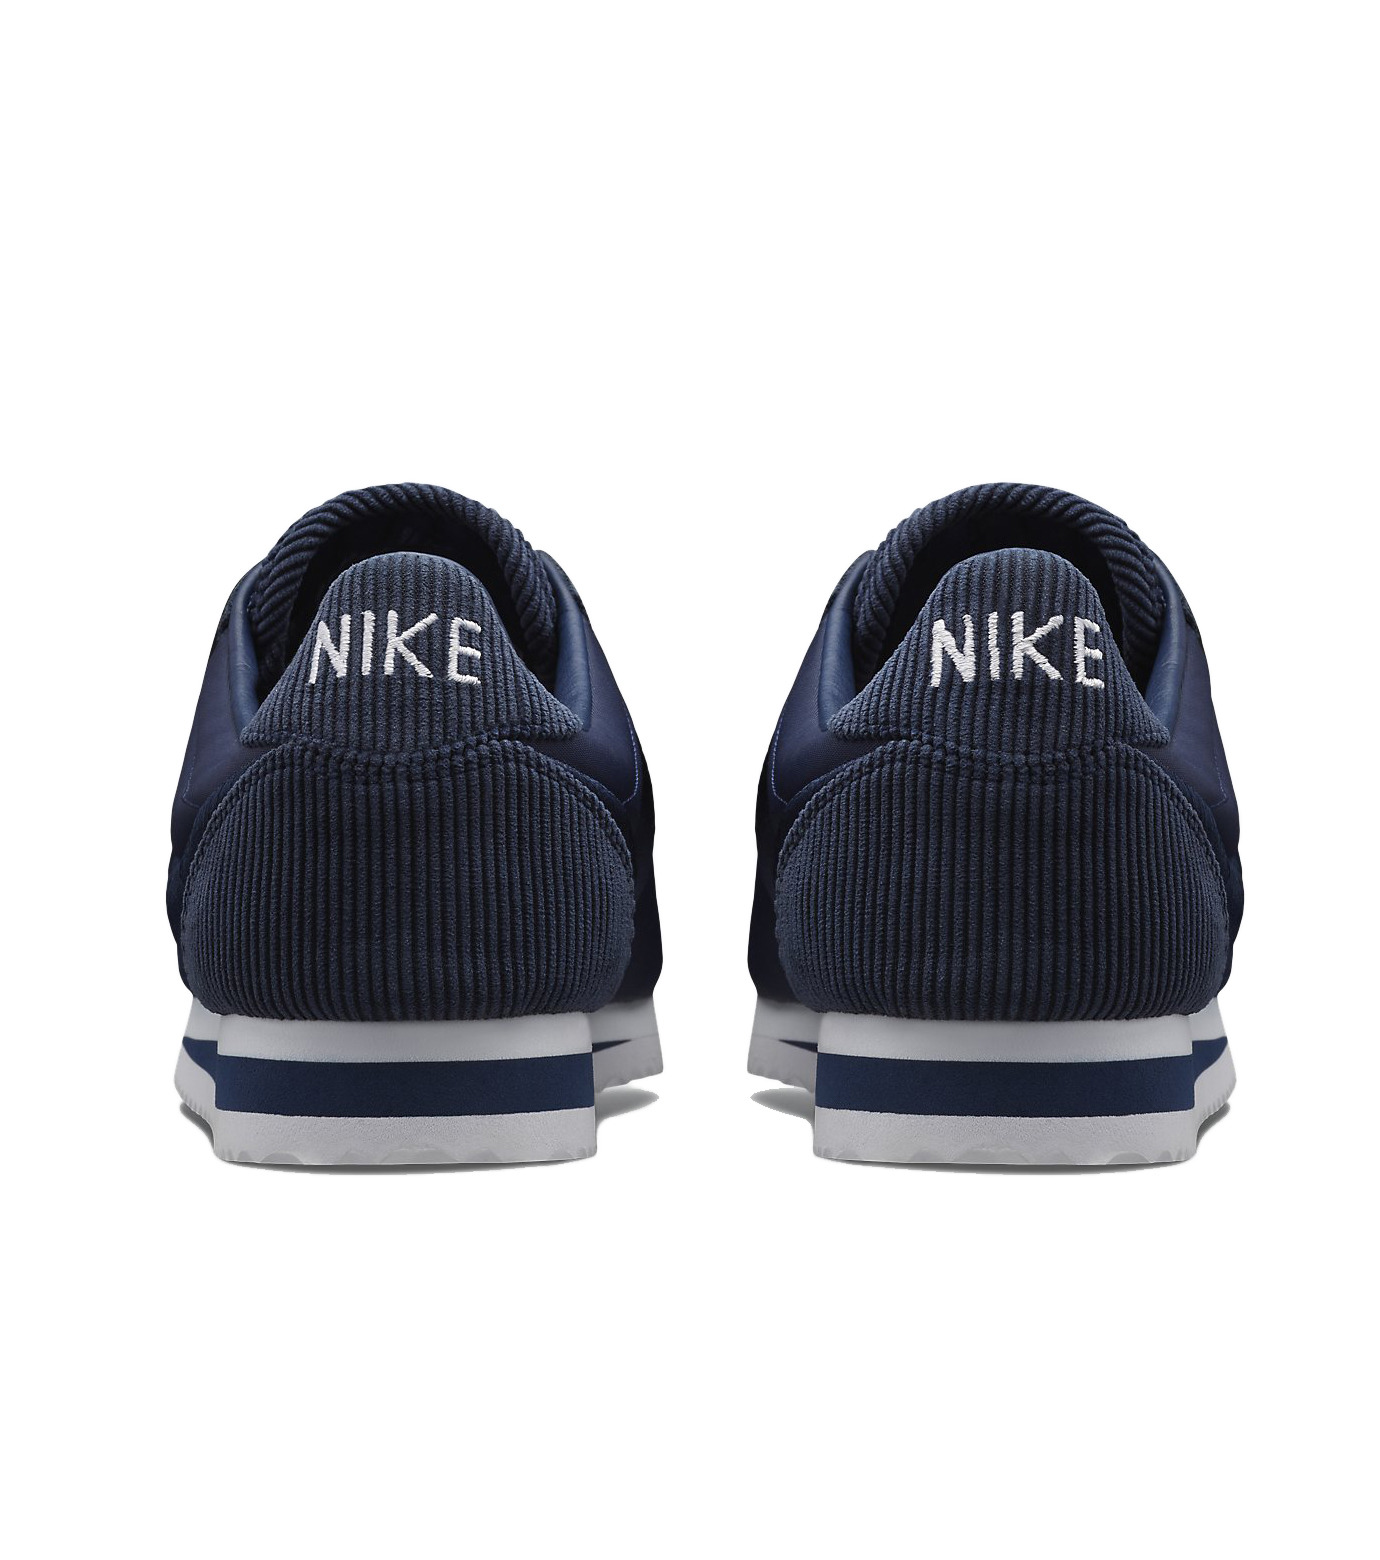 NIKE(ナイキ)のCLASSIC CORTEZ SP-NAVY(シューズ/shoes)-789594-441-93 拡大詳細画像5